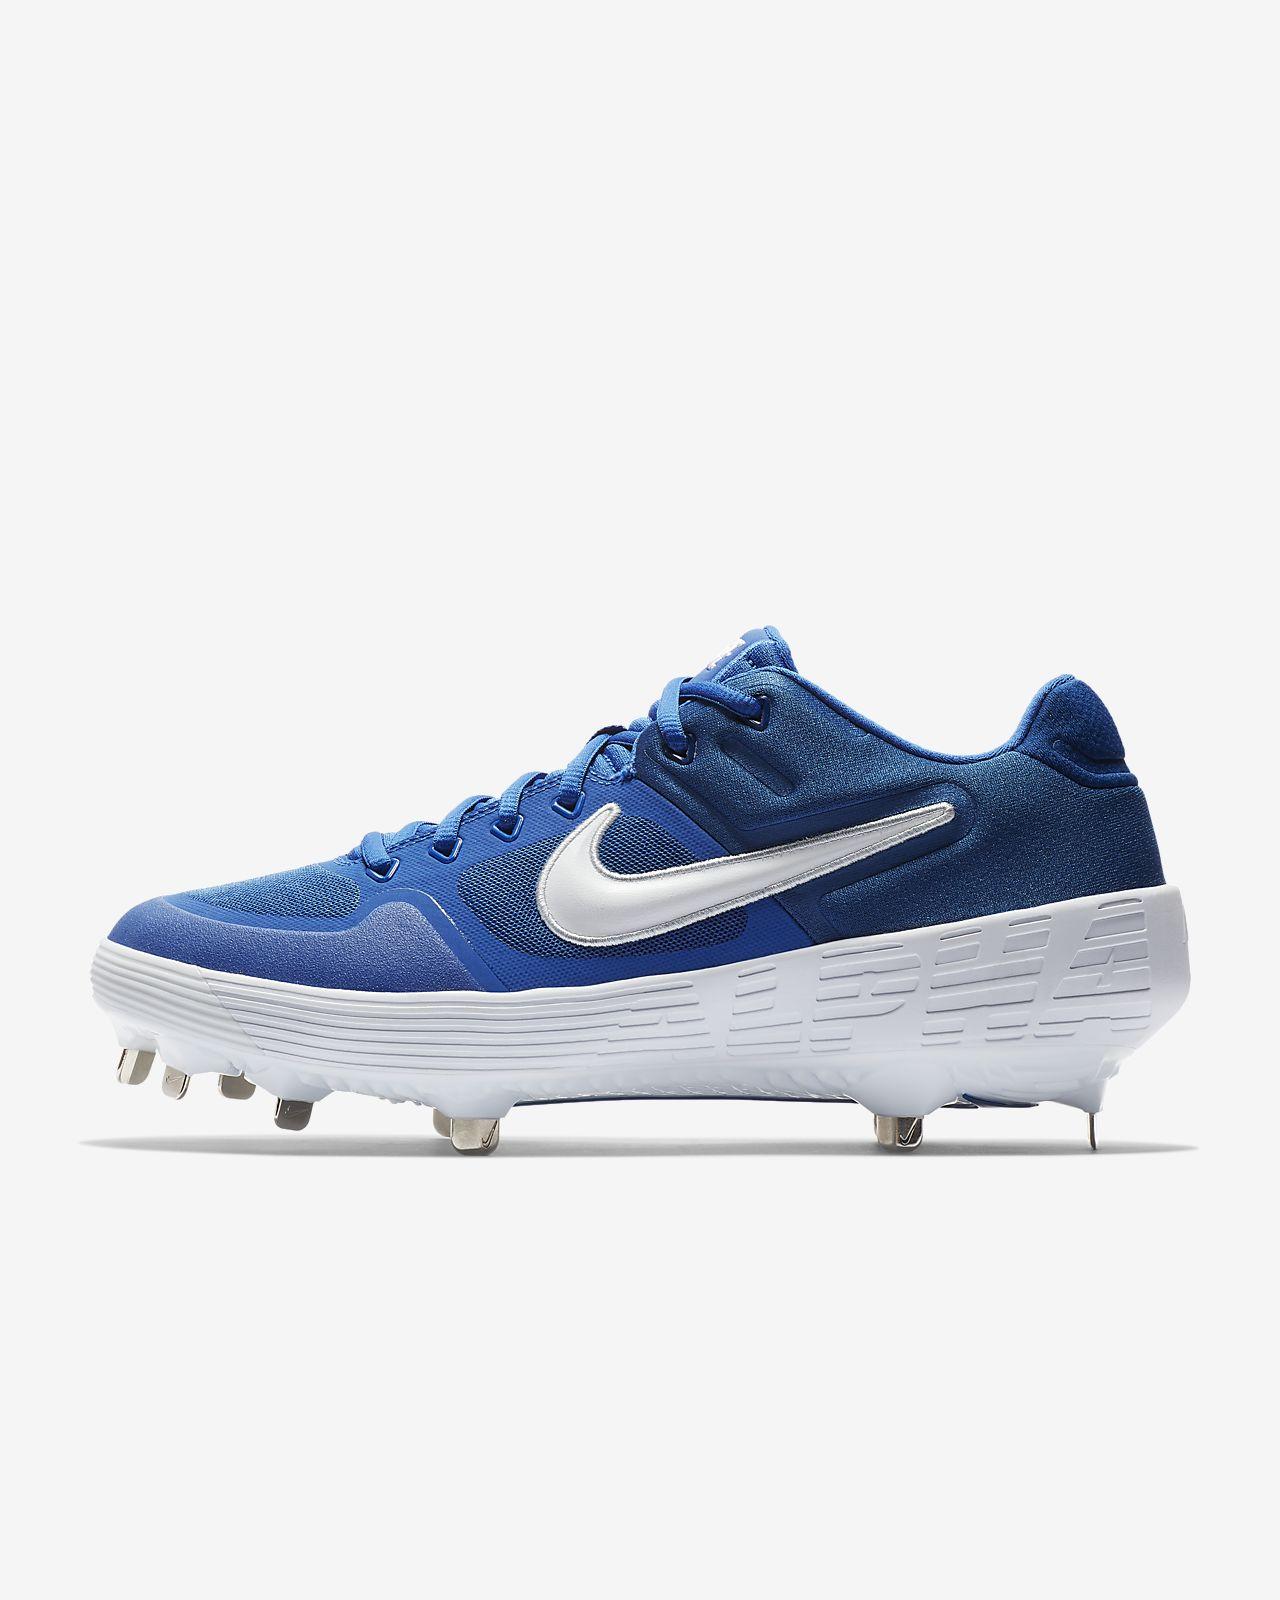 caa58c1206c Nike Alpha Huarache Elite 2 Low Baseball Cleat. Nike.com